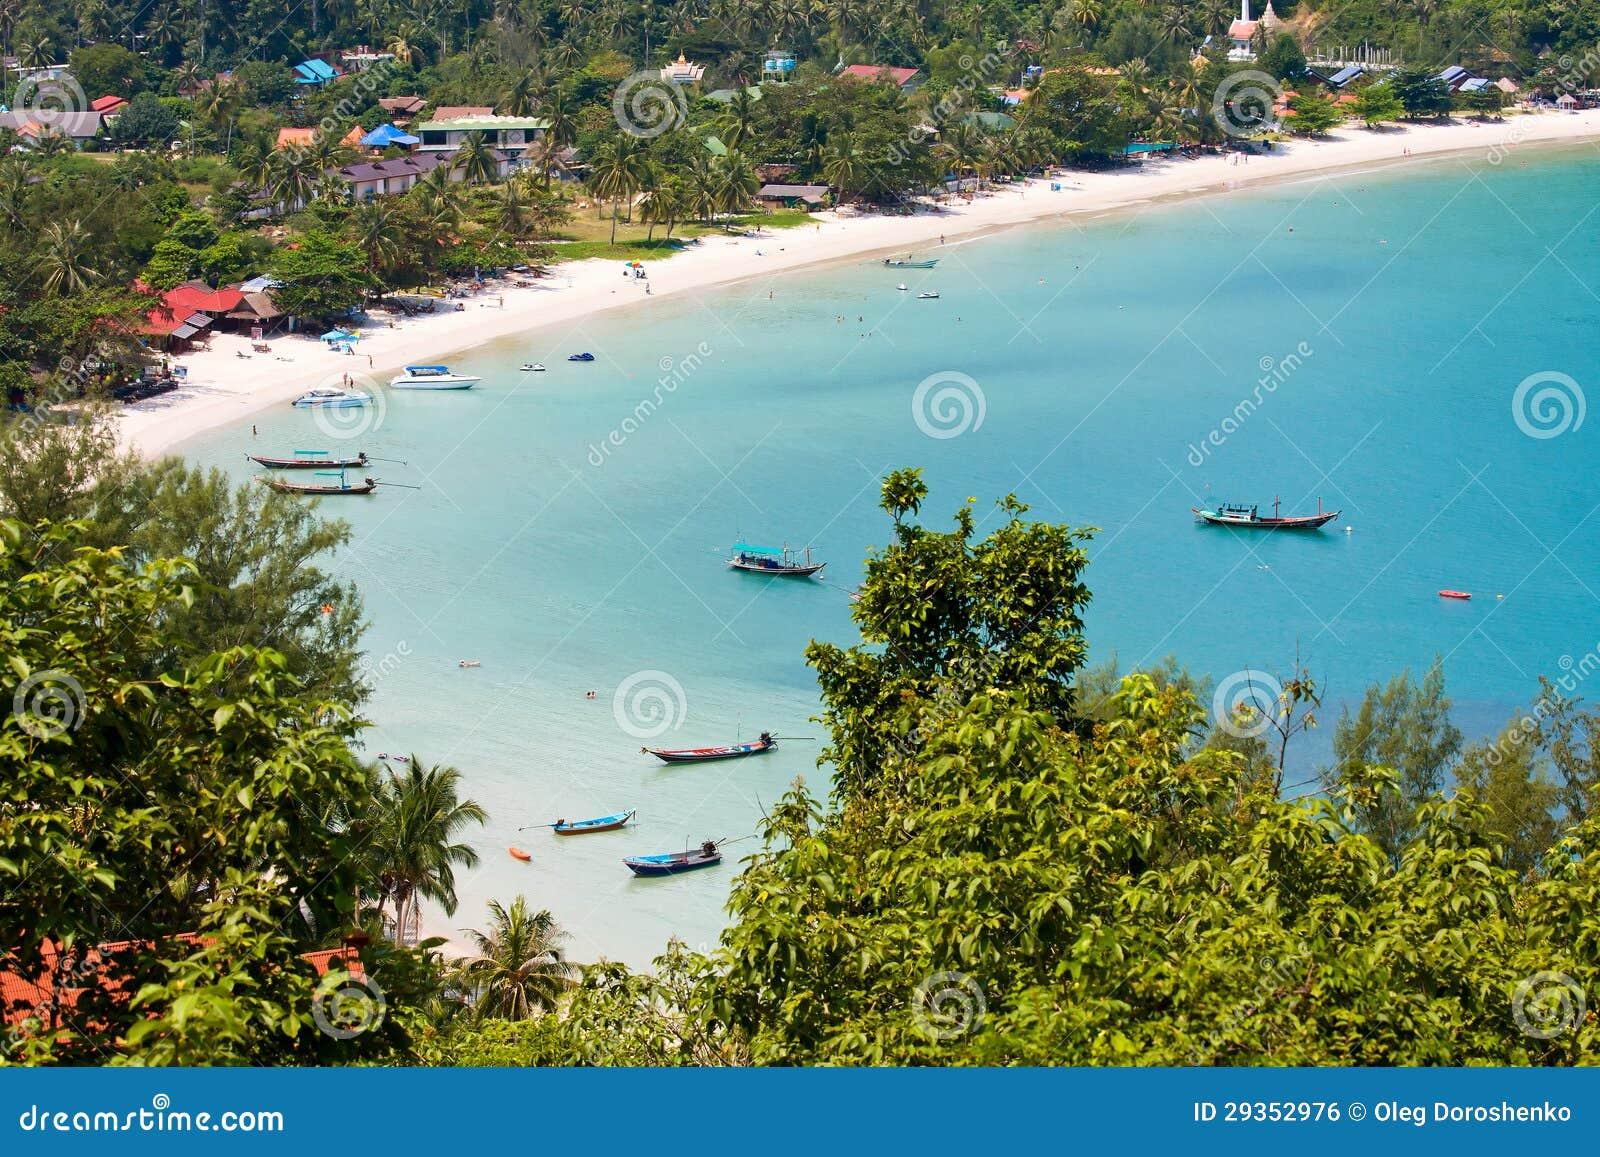 Island Koh Phangan, Thailand.